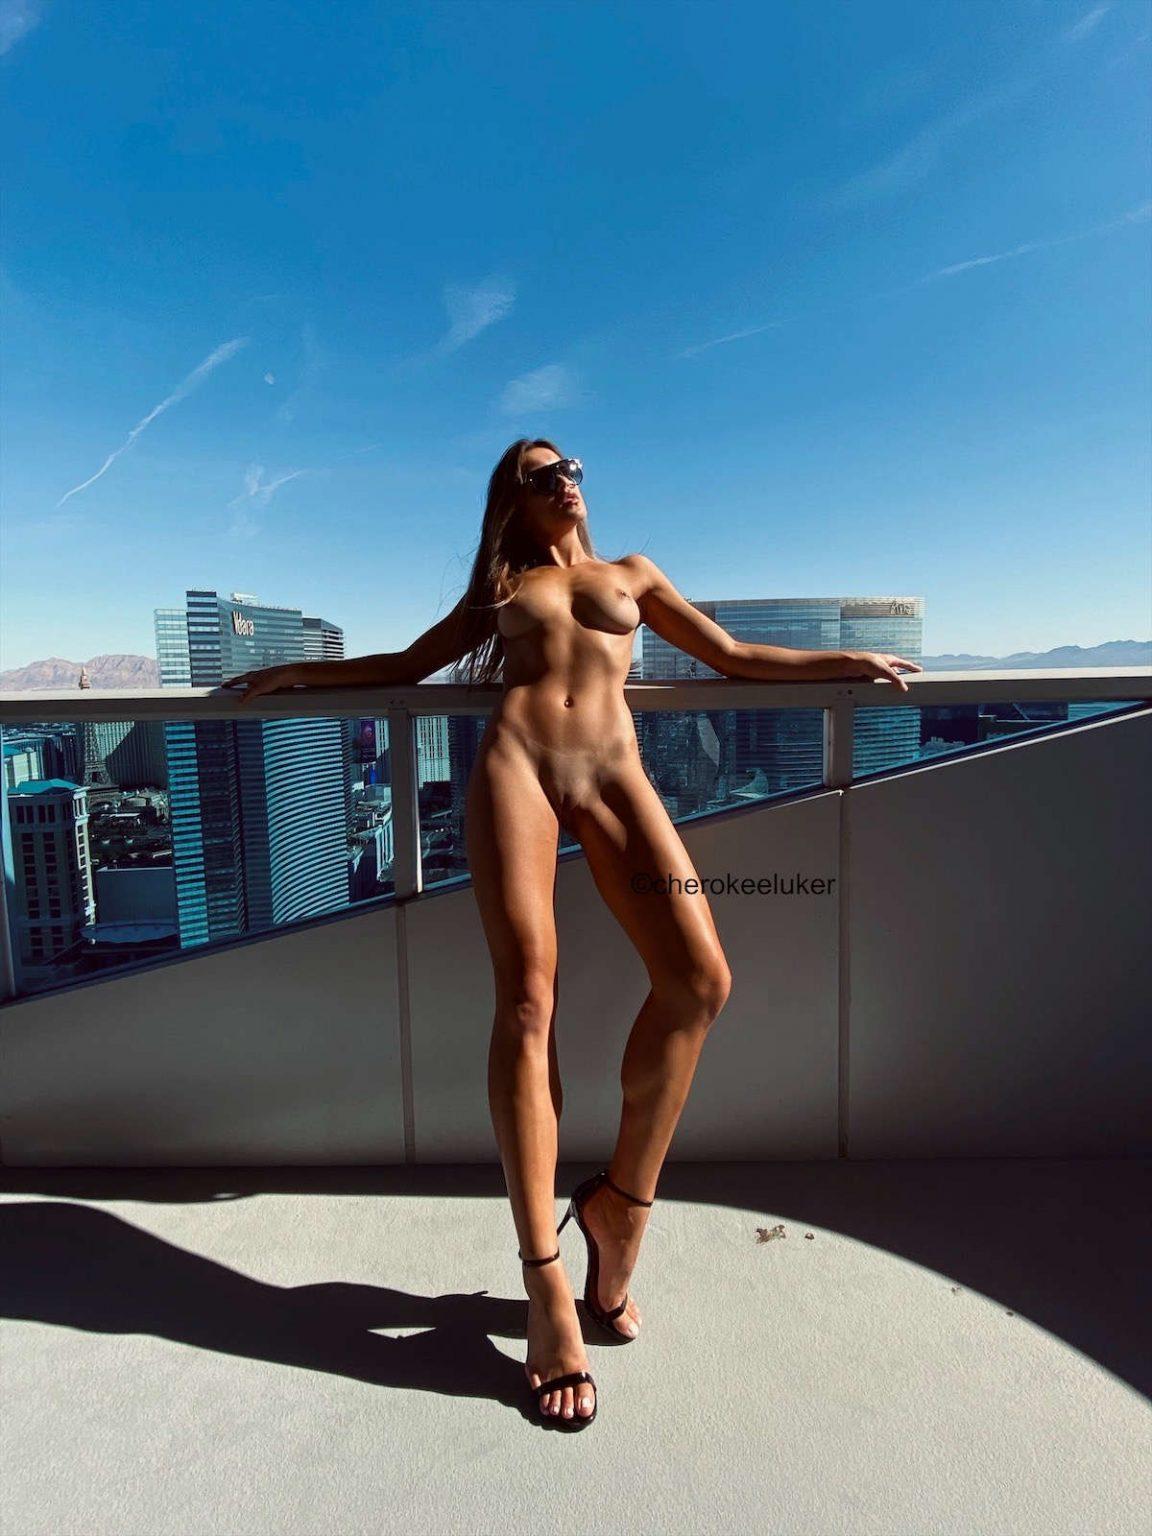 Fit-Naked-Girls-com-Cherokee-Luker-nude-fit-27-1152x1536